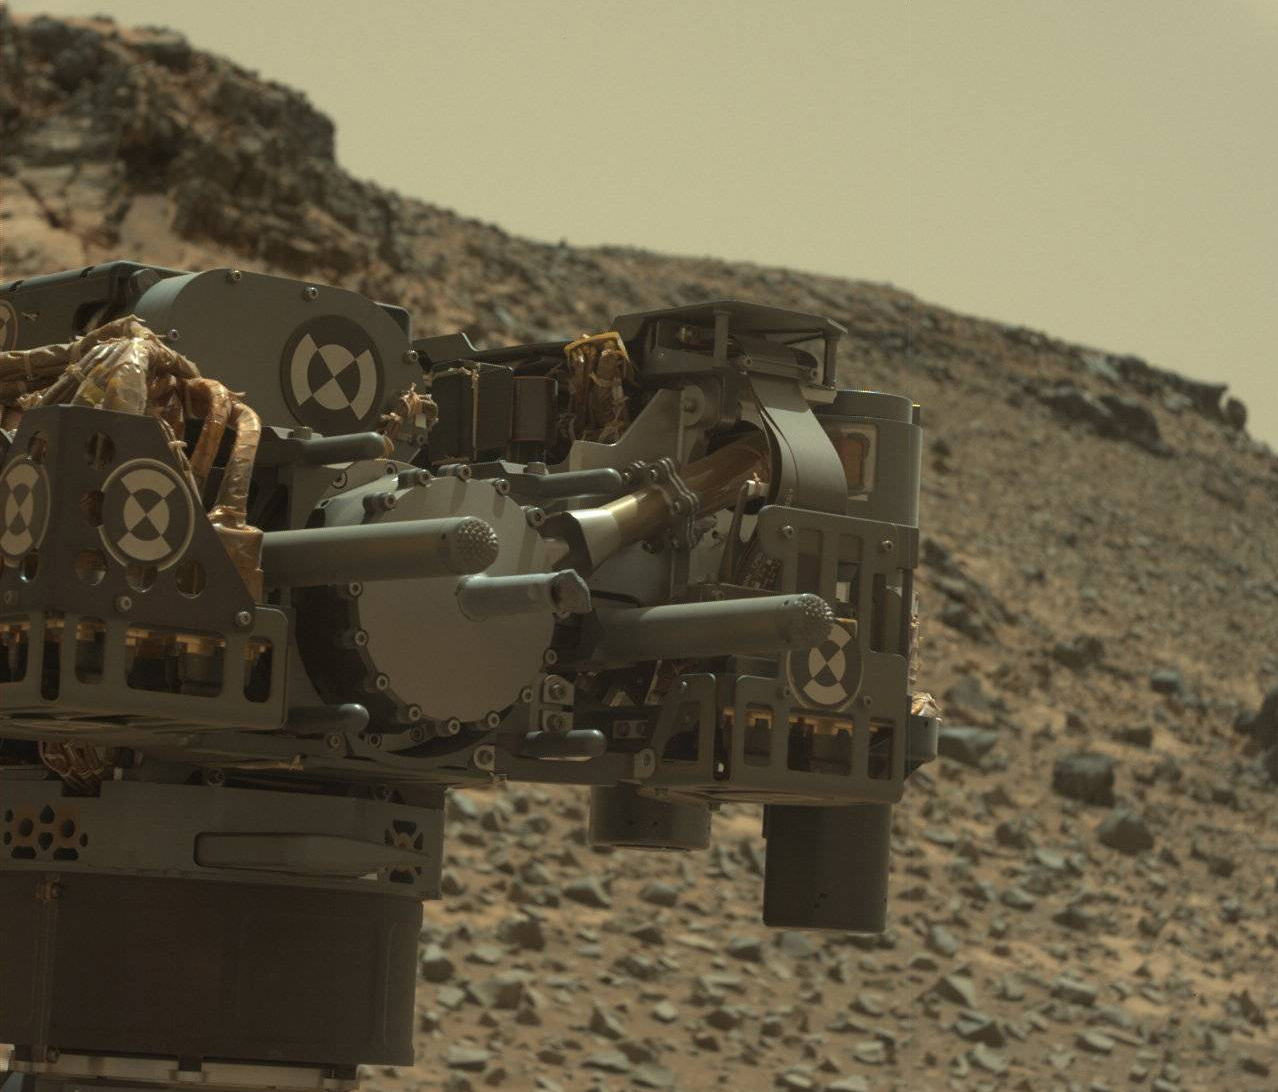 mars rover drill status - photo #15